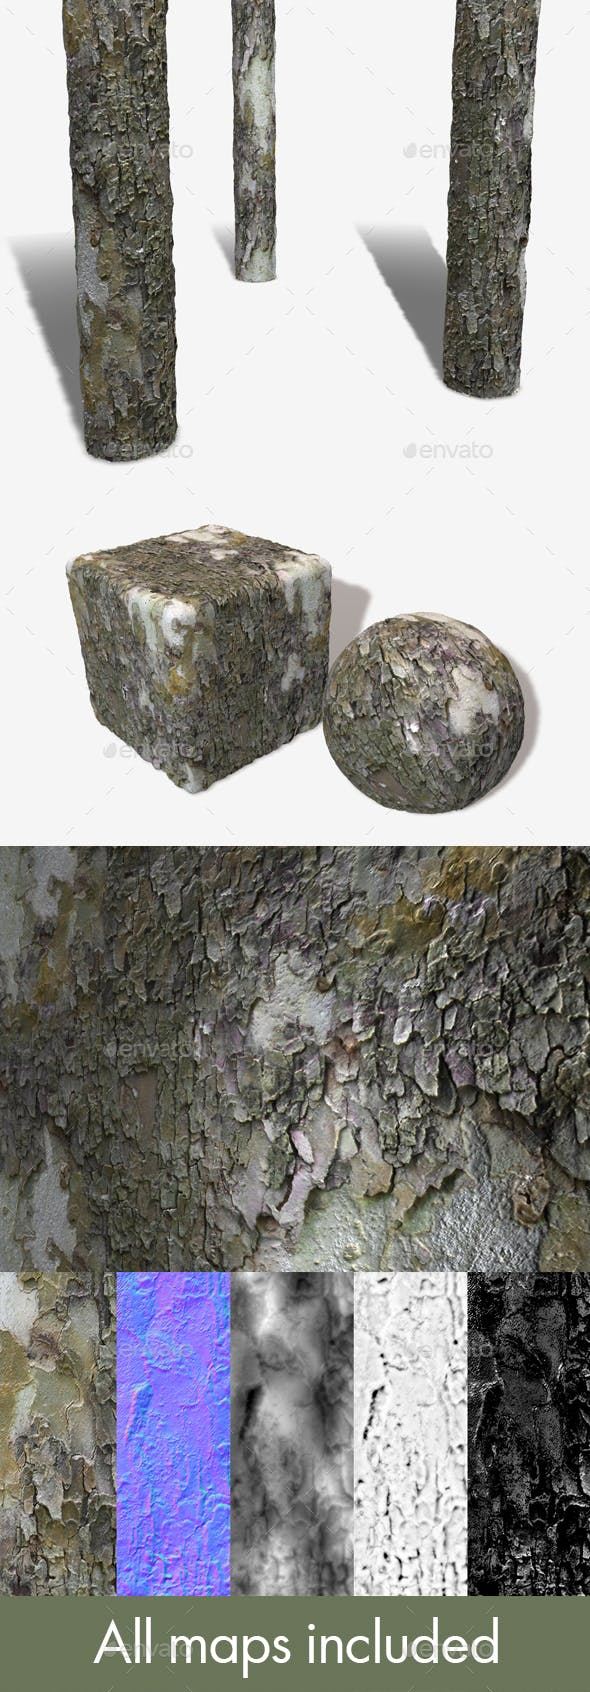 Peeling Bark Seamless Texture - 3DOcean Item for Sale